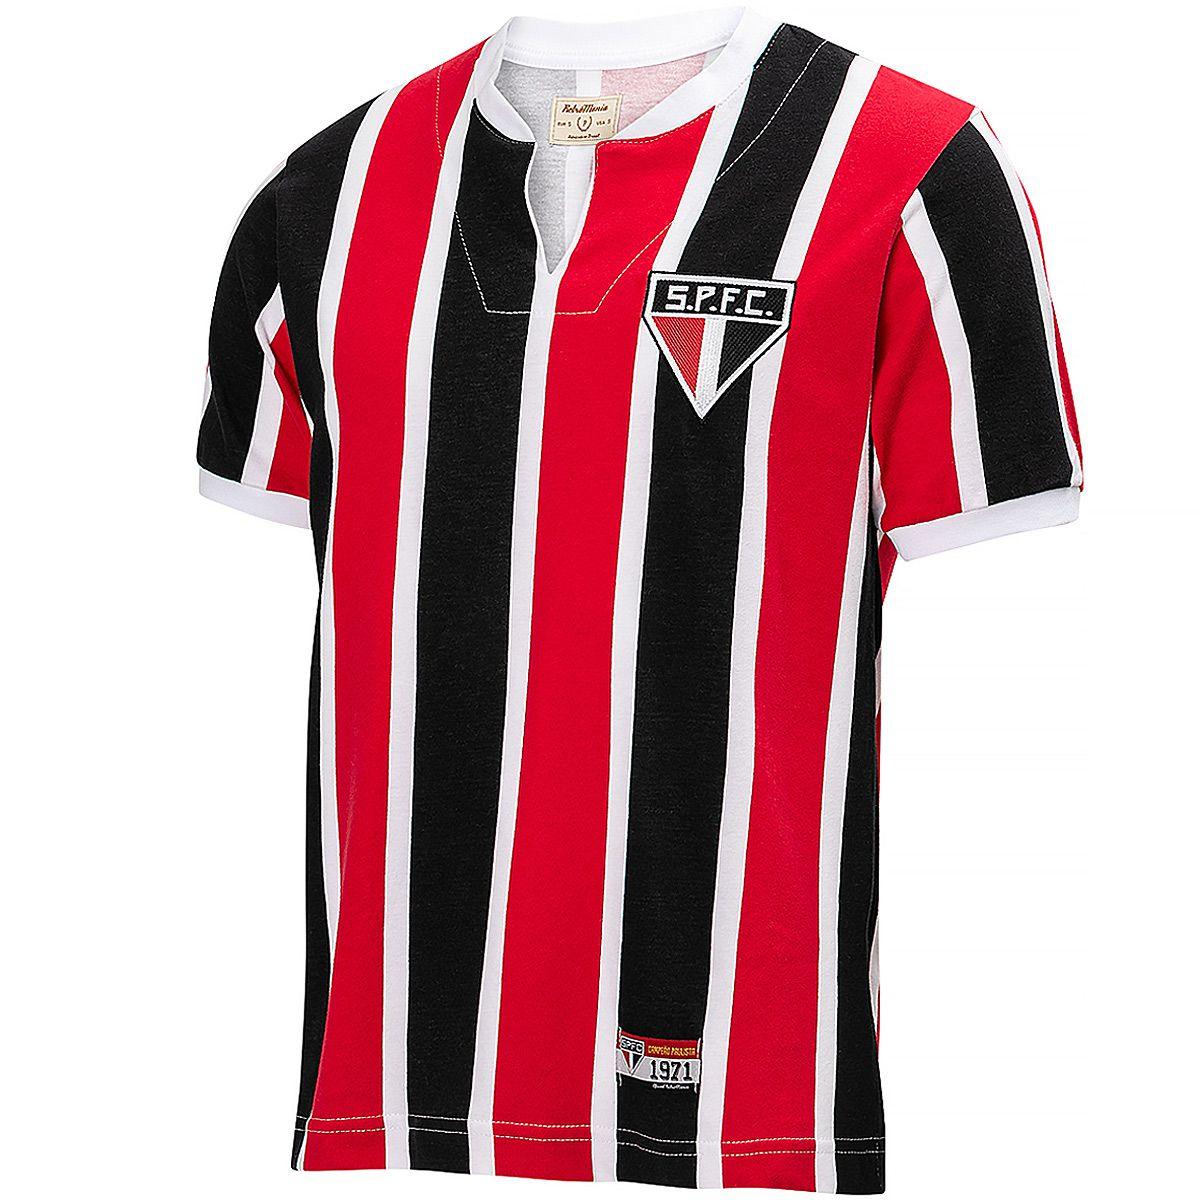 Camisa São Paulo Retrô 1970/71 Masculina